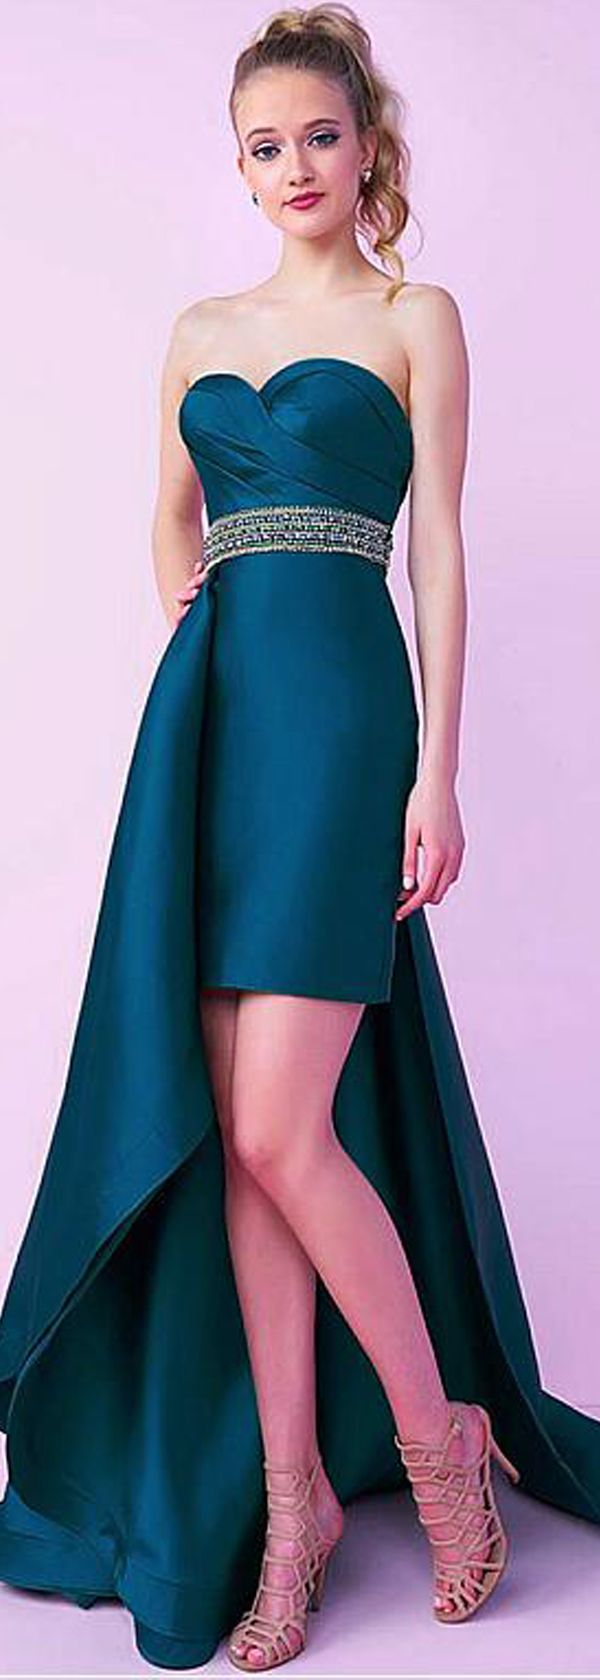 Elegant satin sweetheart neckline sheath column prom dresses with